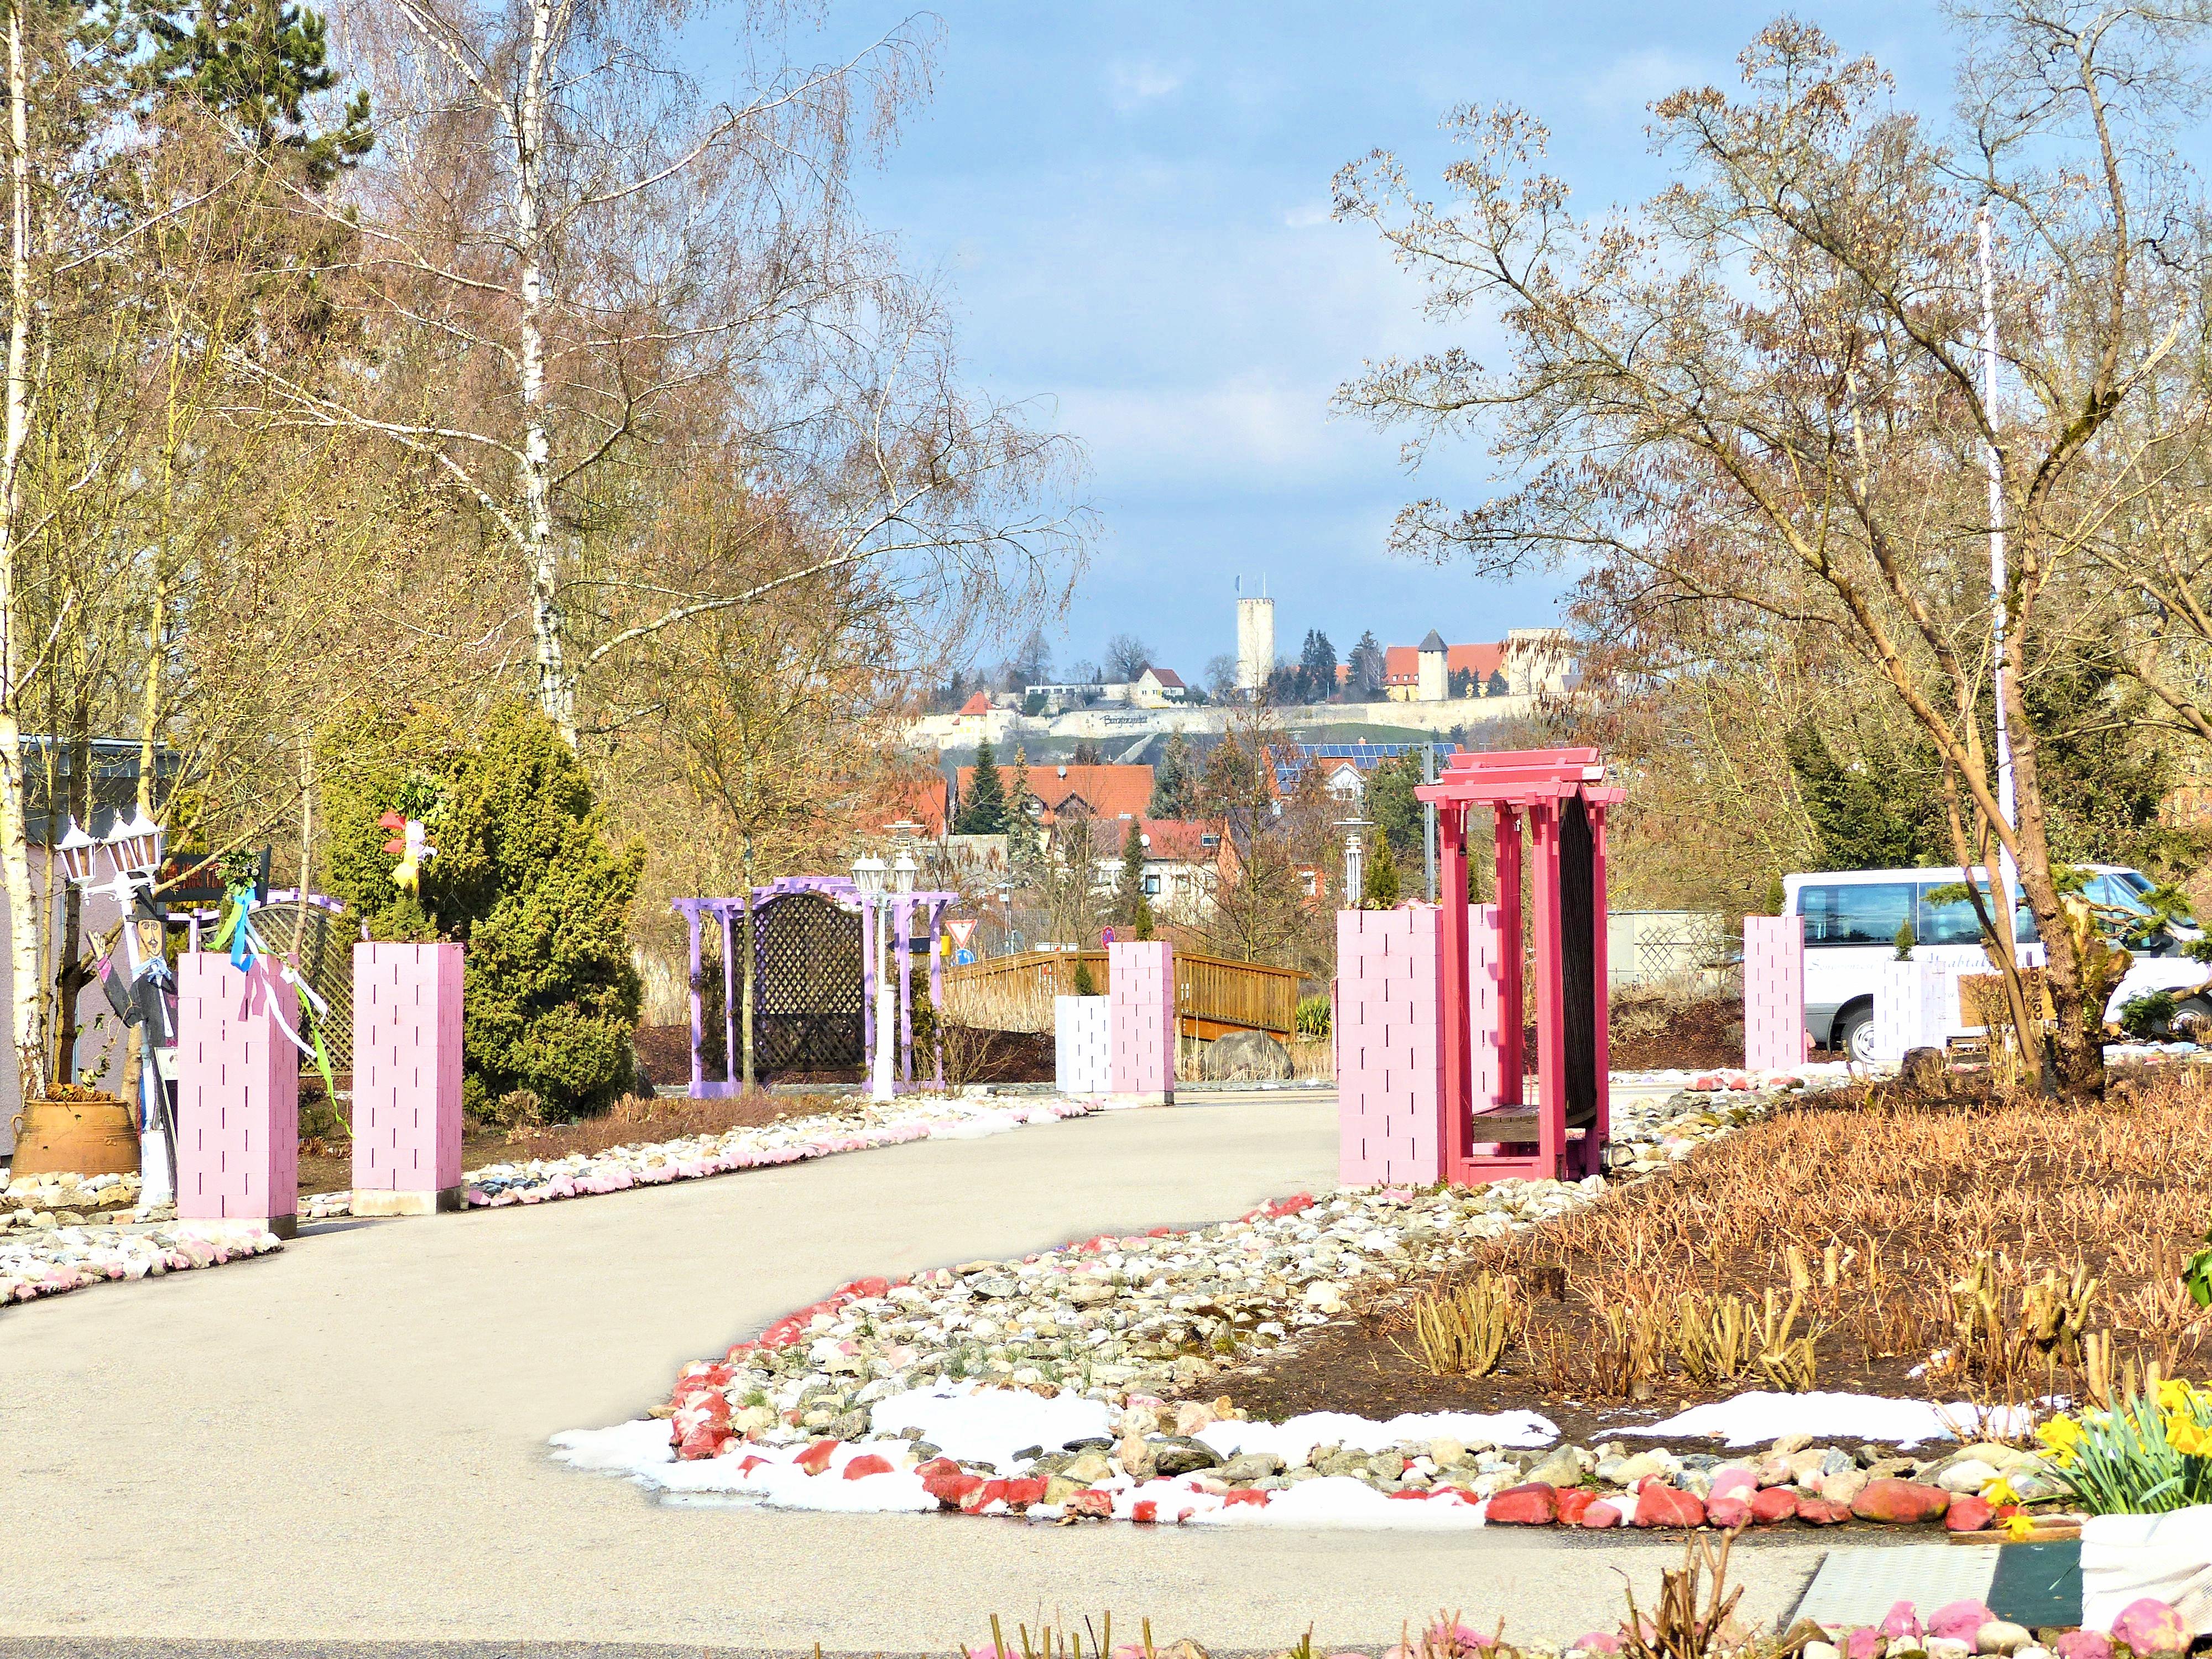 Seniorenresidenz Naabtalpark